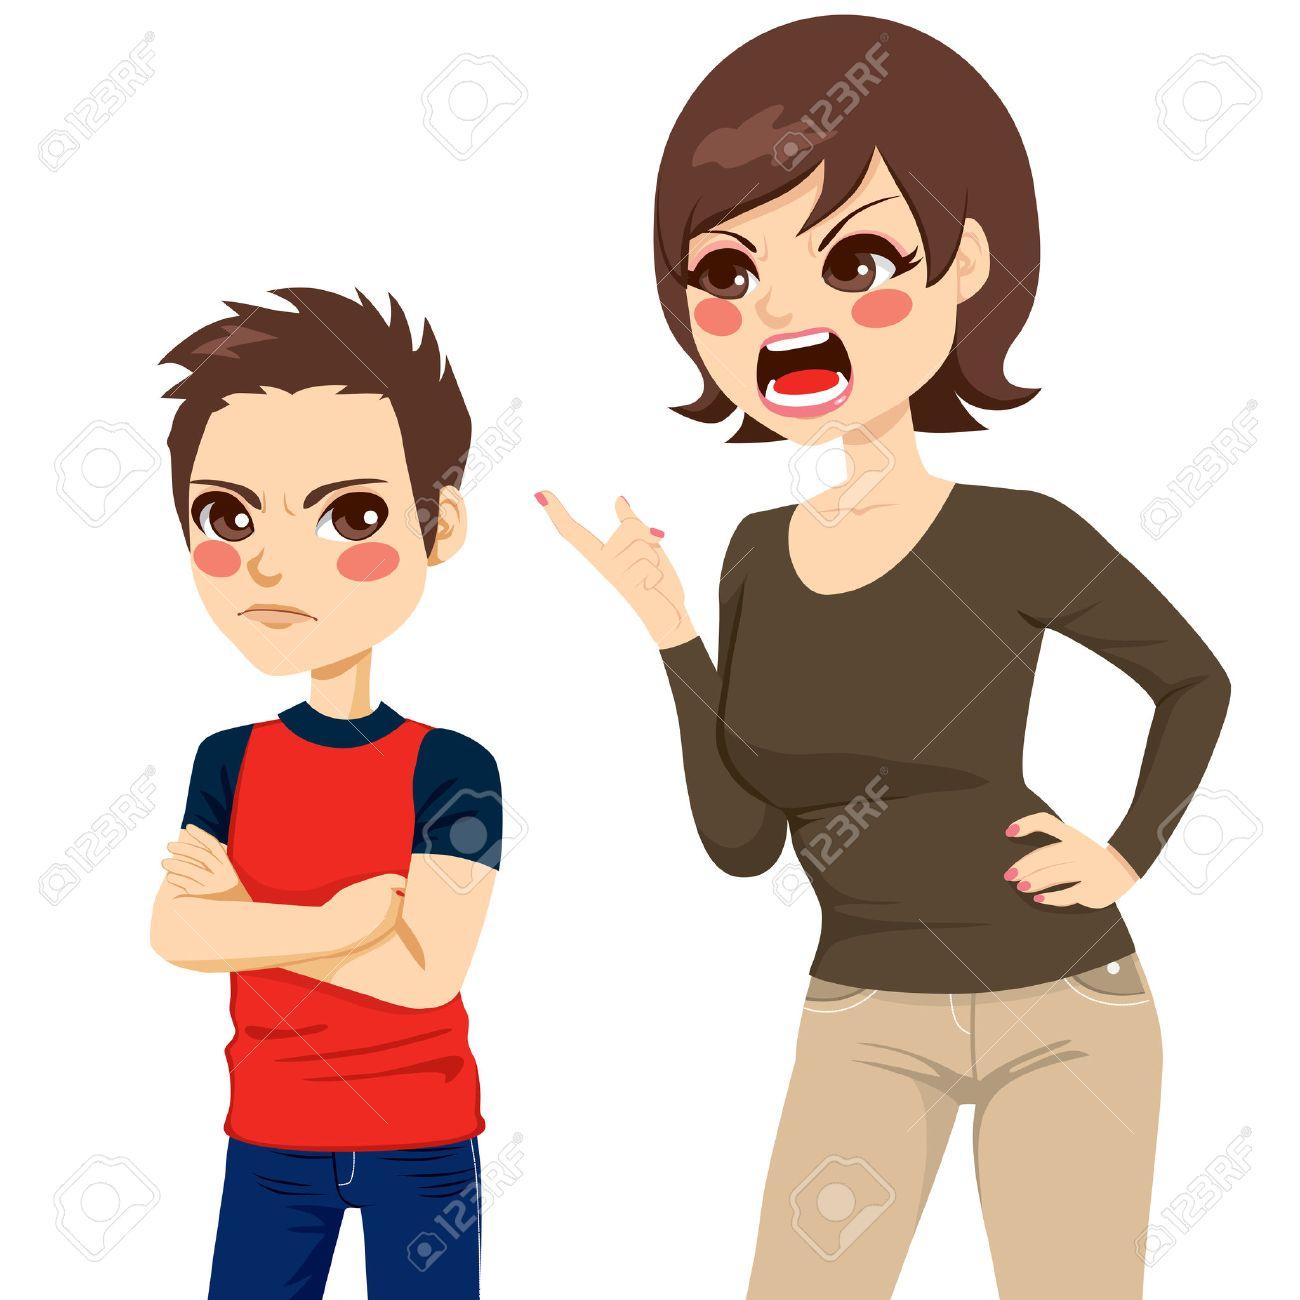 böse Mutter Bilder